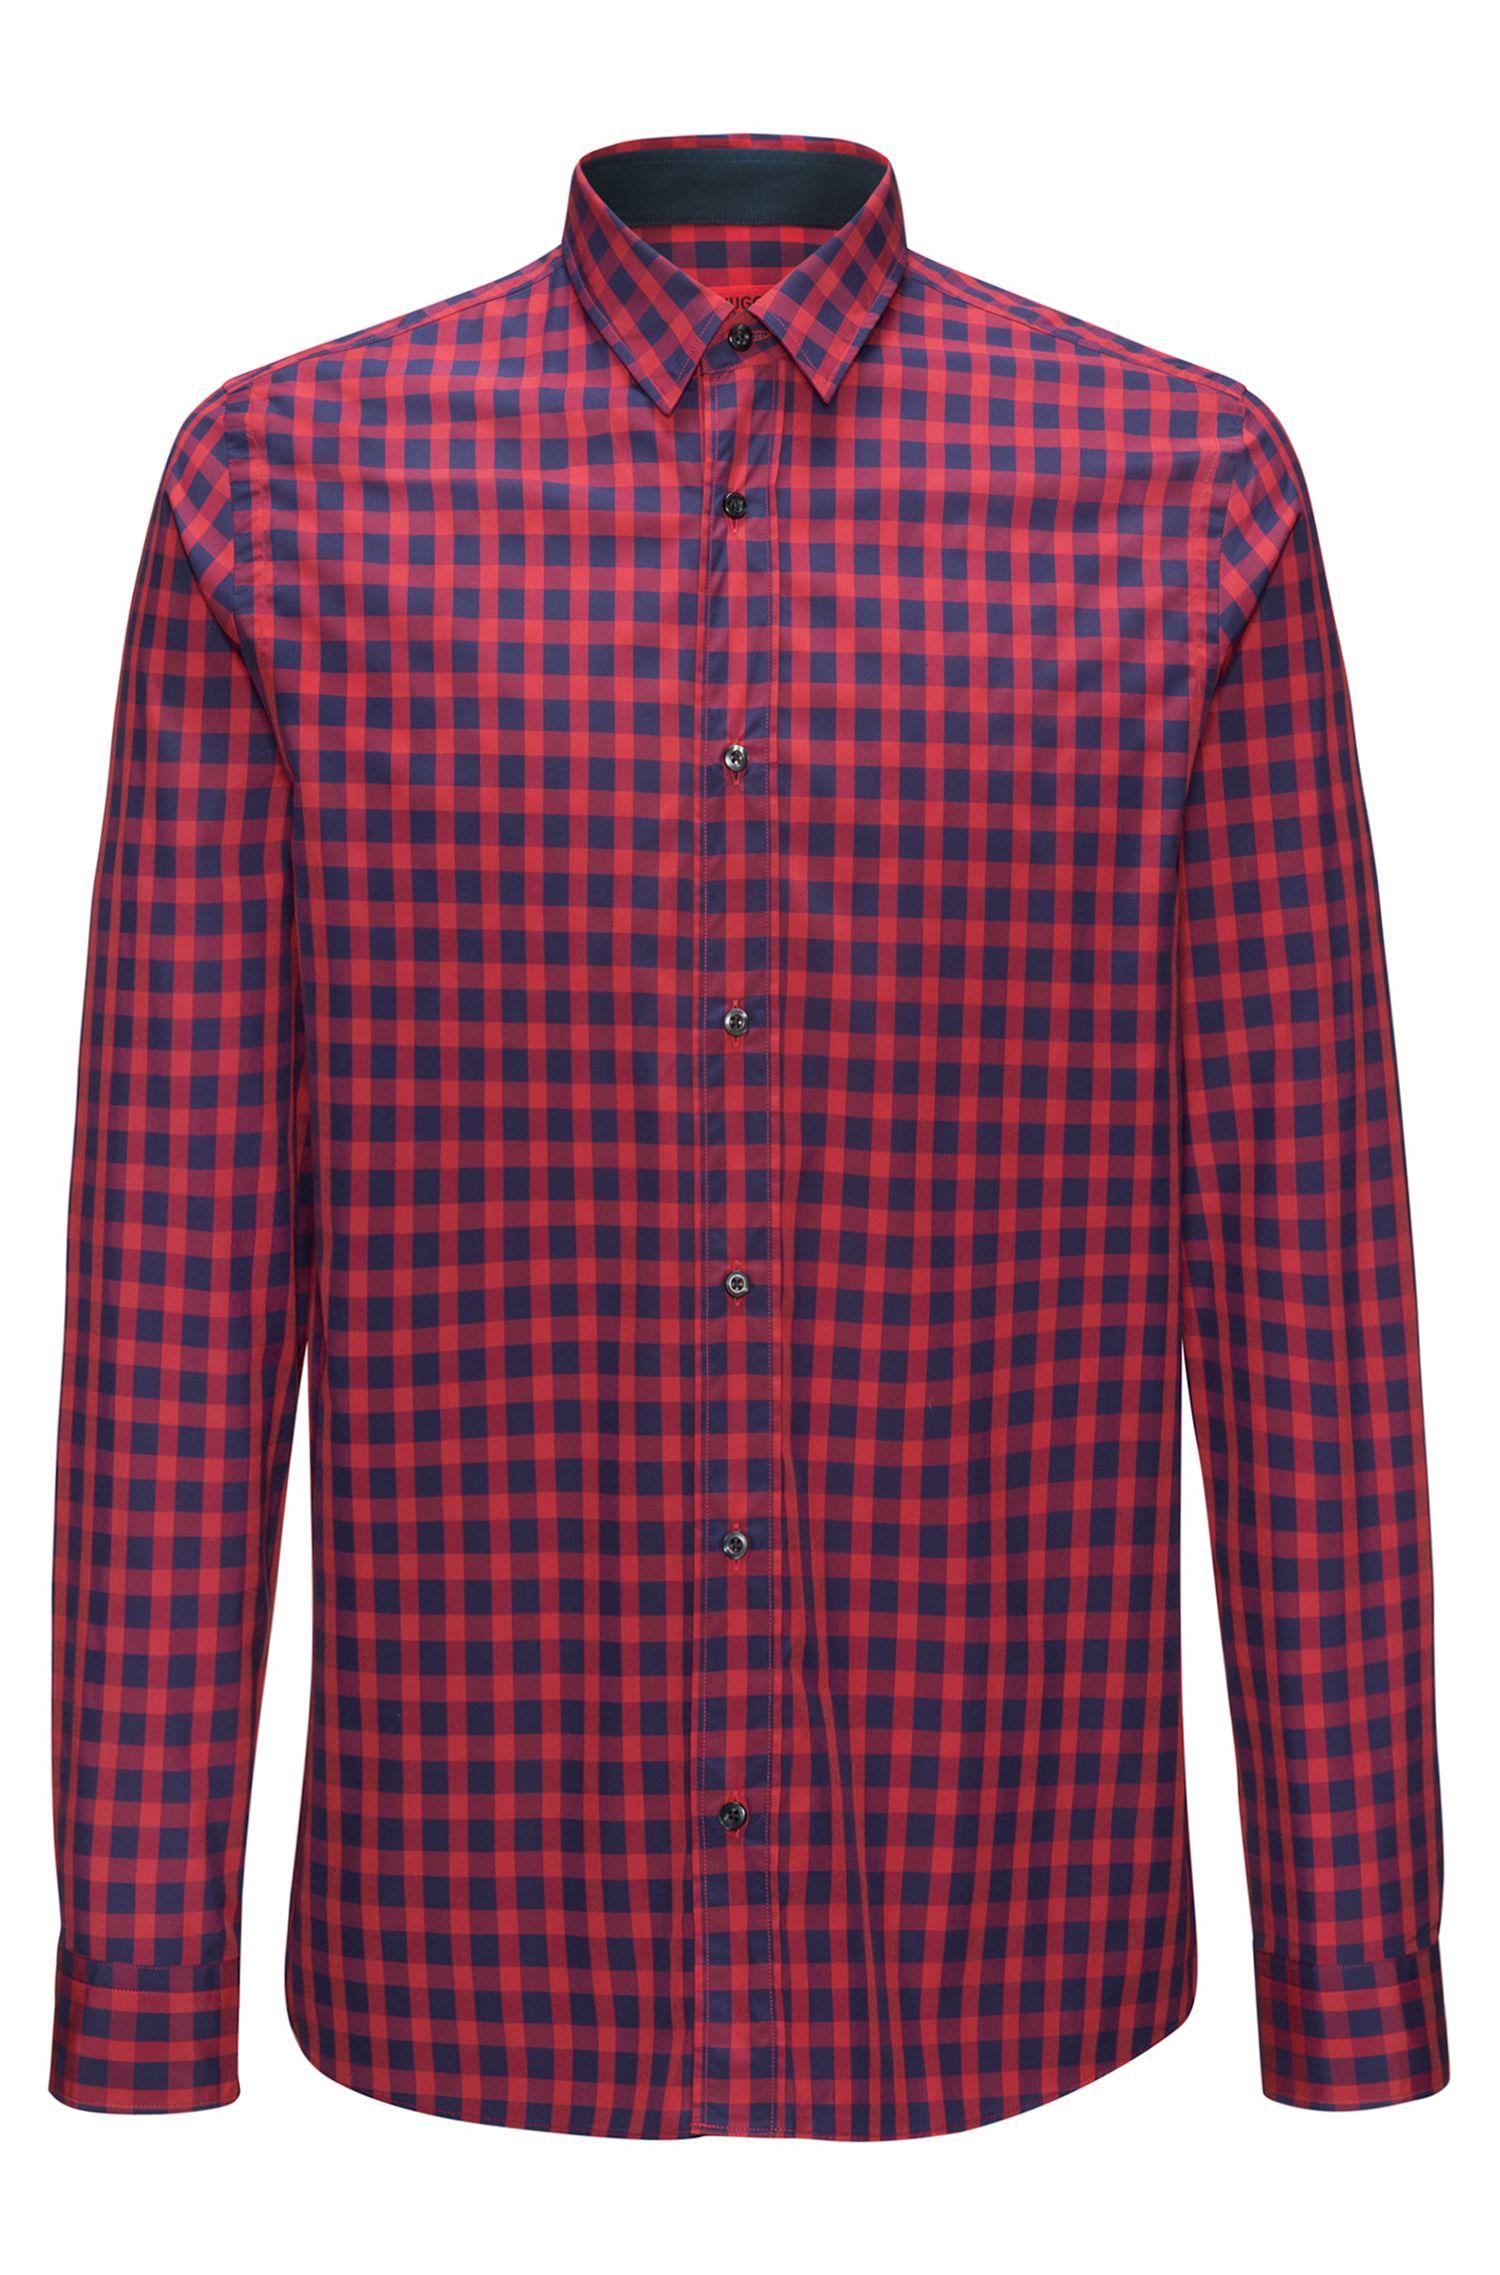 Cotton shirt in a Vichy check